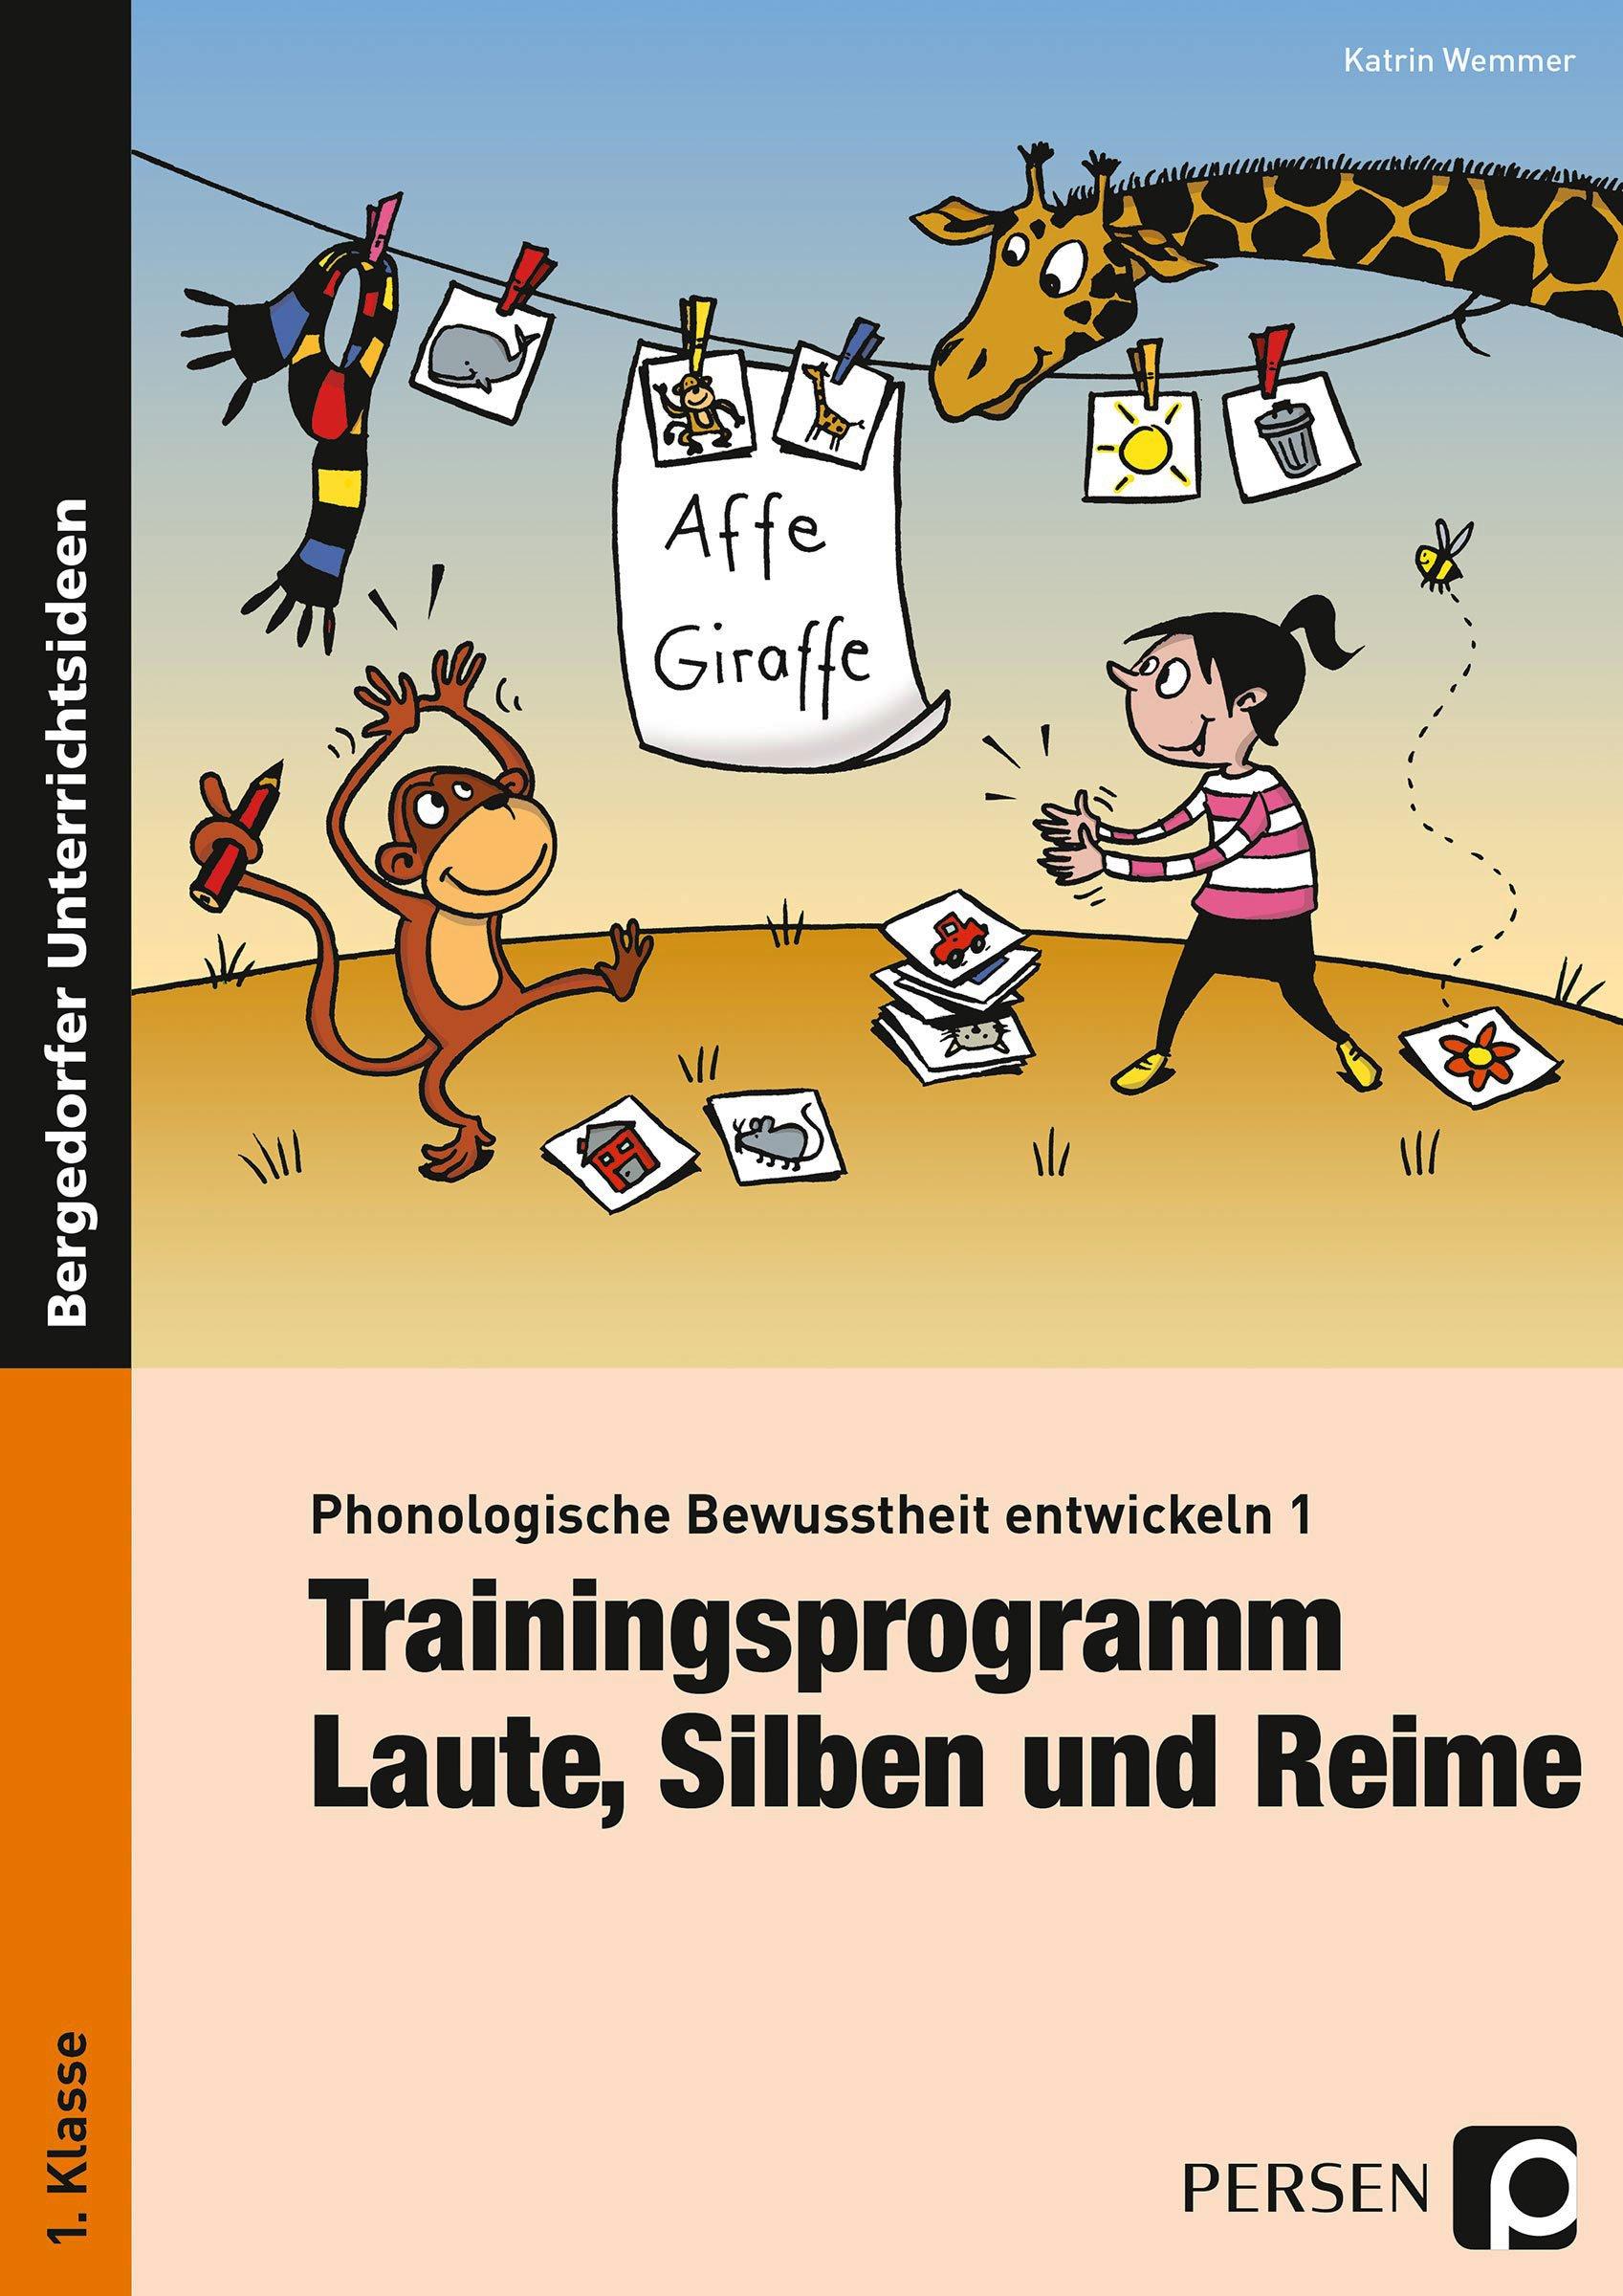 Phonologische Bewusstheit entwickeln 1: Trainingsprogramm: Laute ...